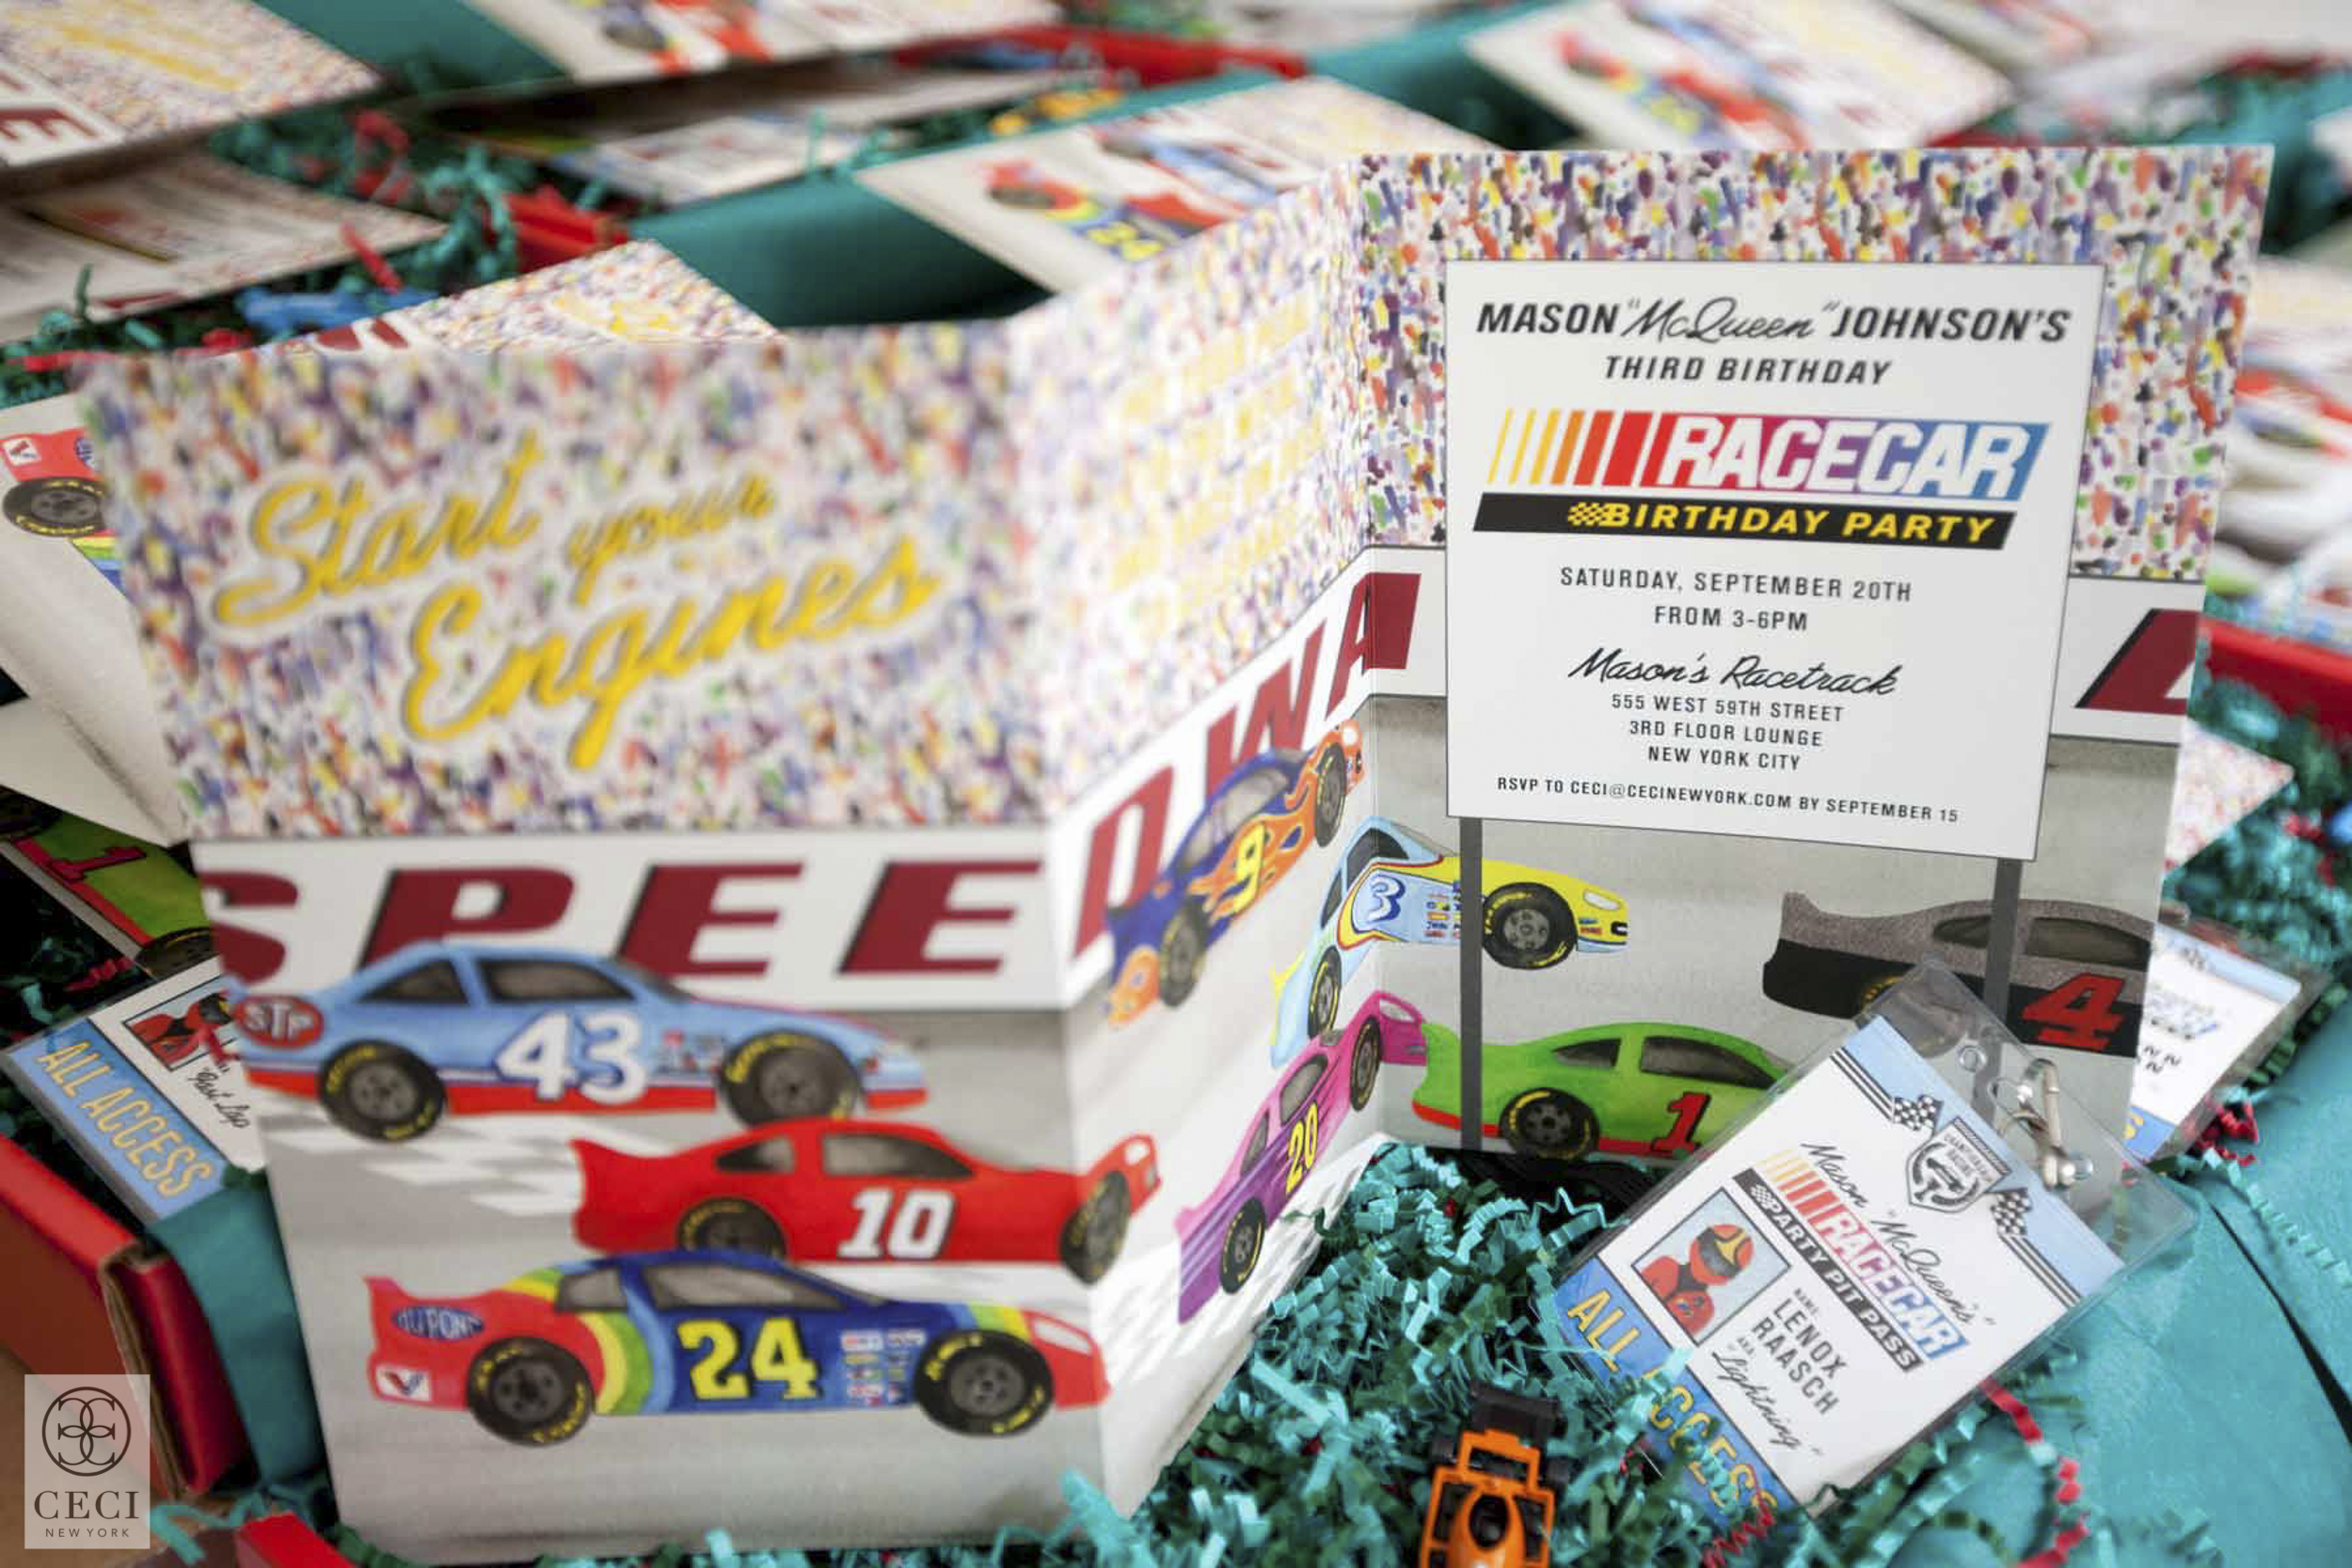 ceci_new_york_mason_ceci_johnson_race_car_birthday_party-25.jpg